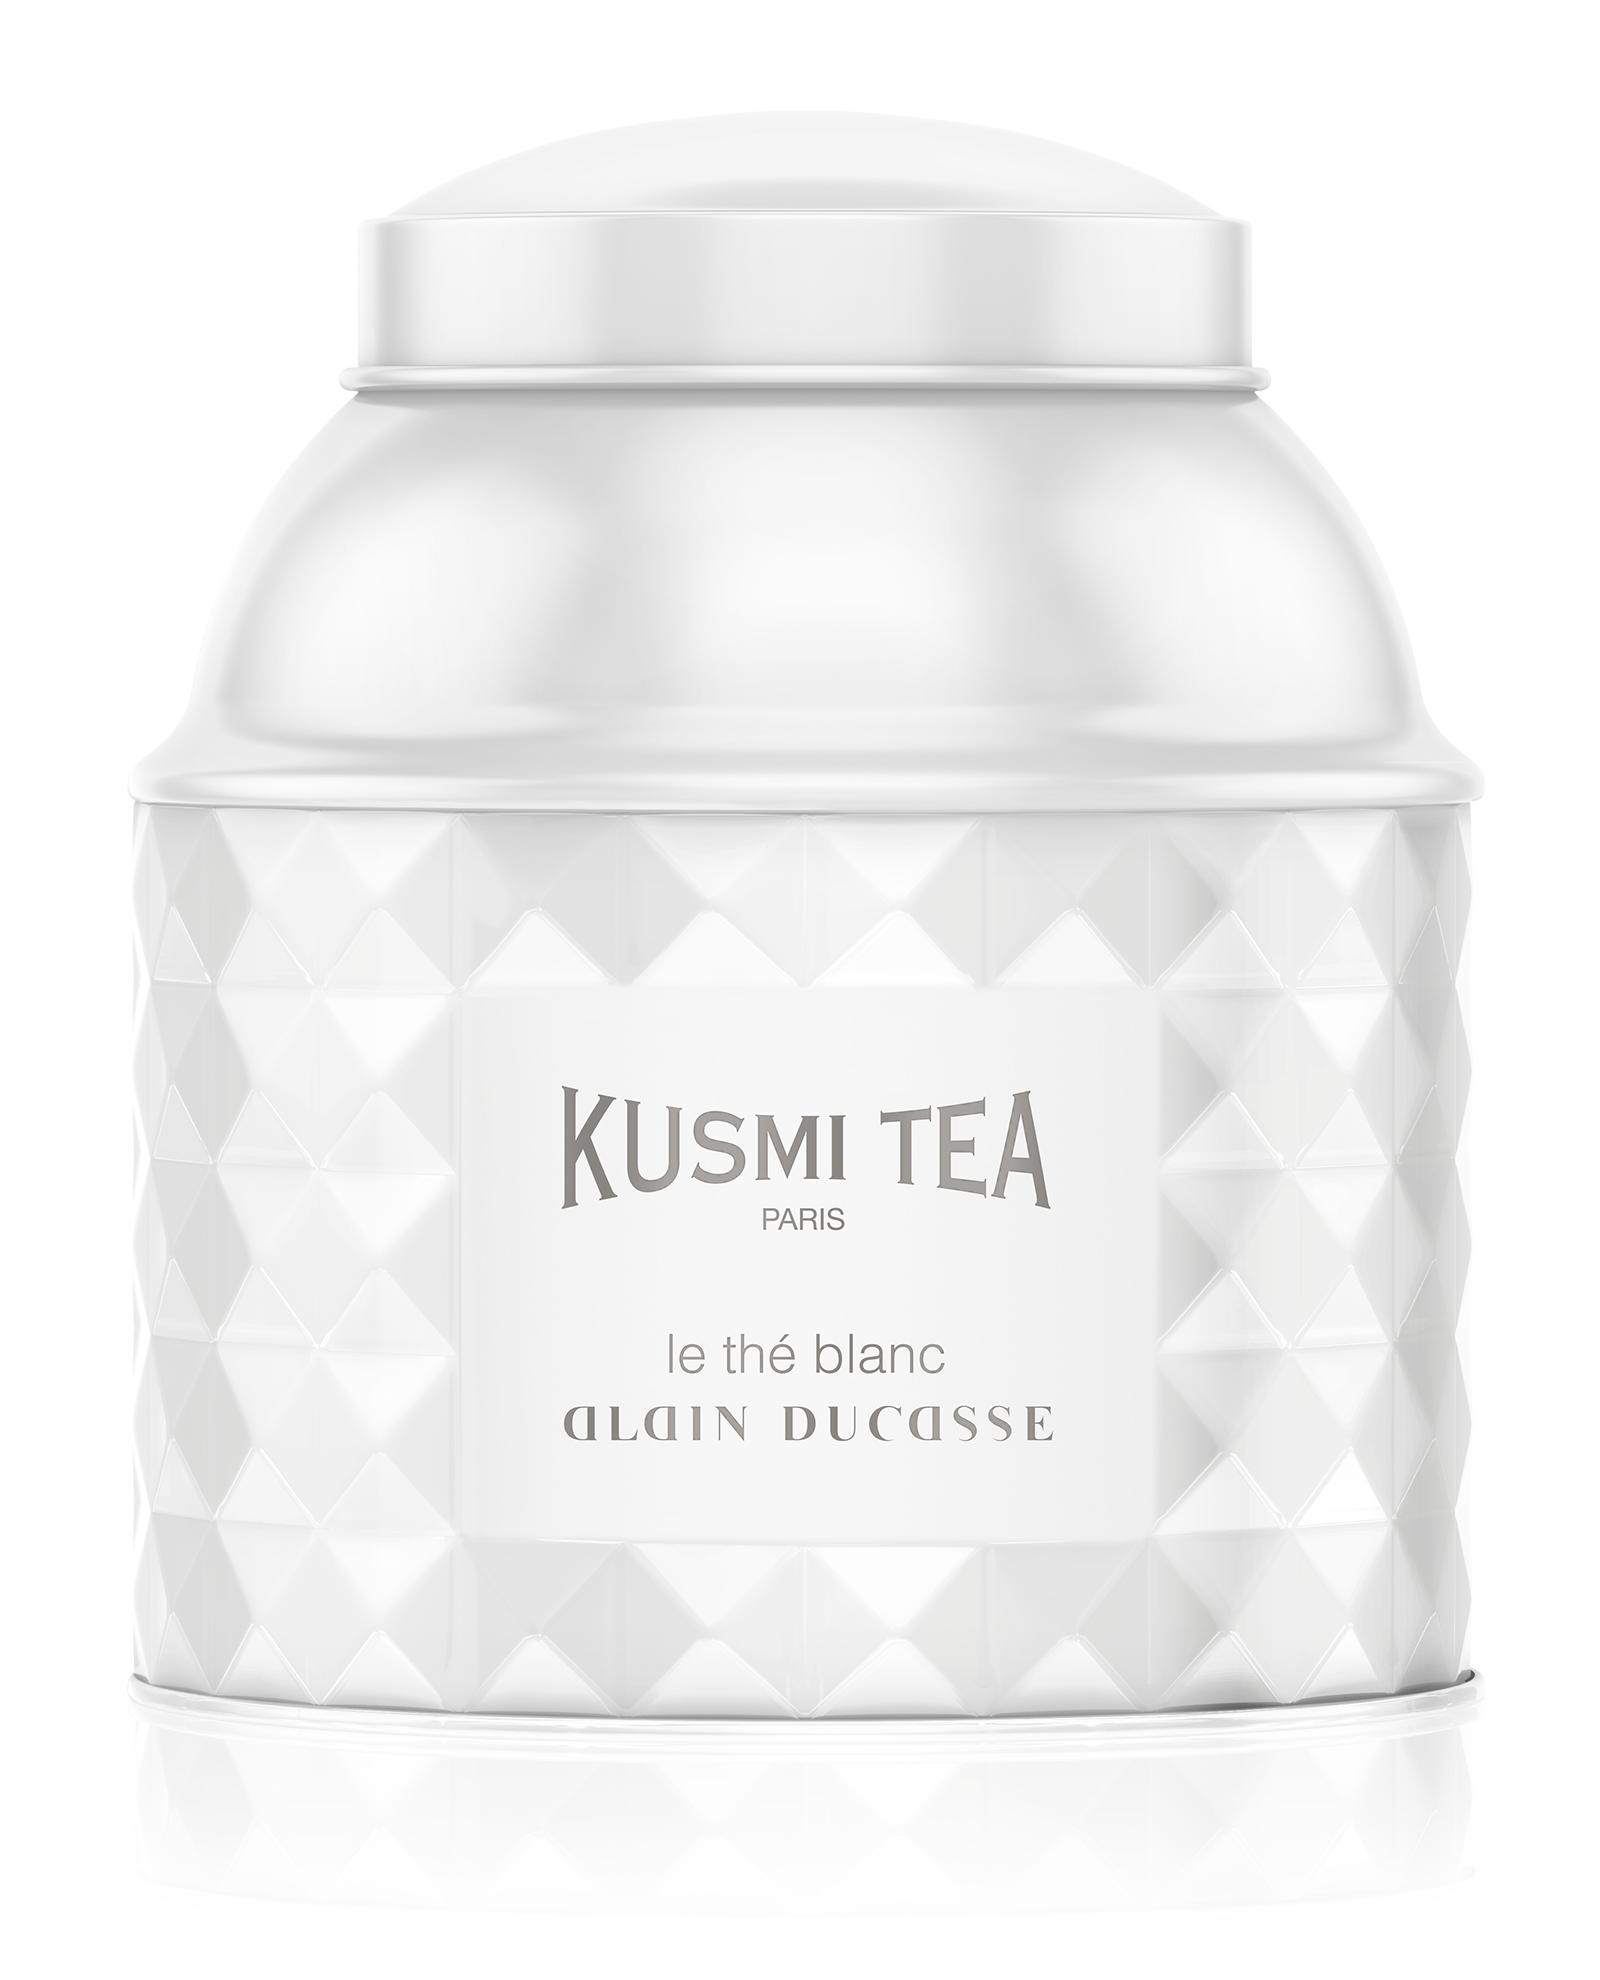 KUSMI TEA Le Thé blanc Alain Ducasse